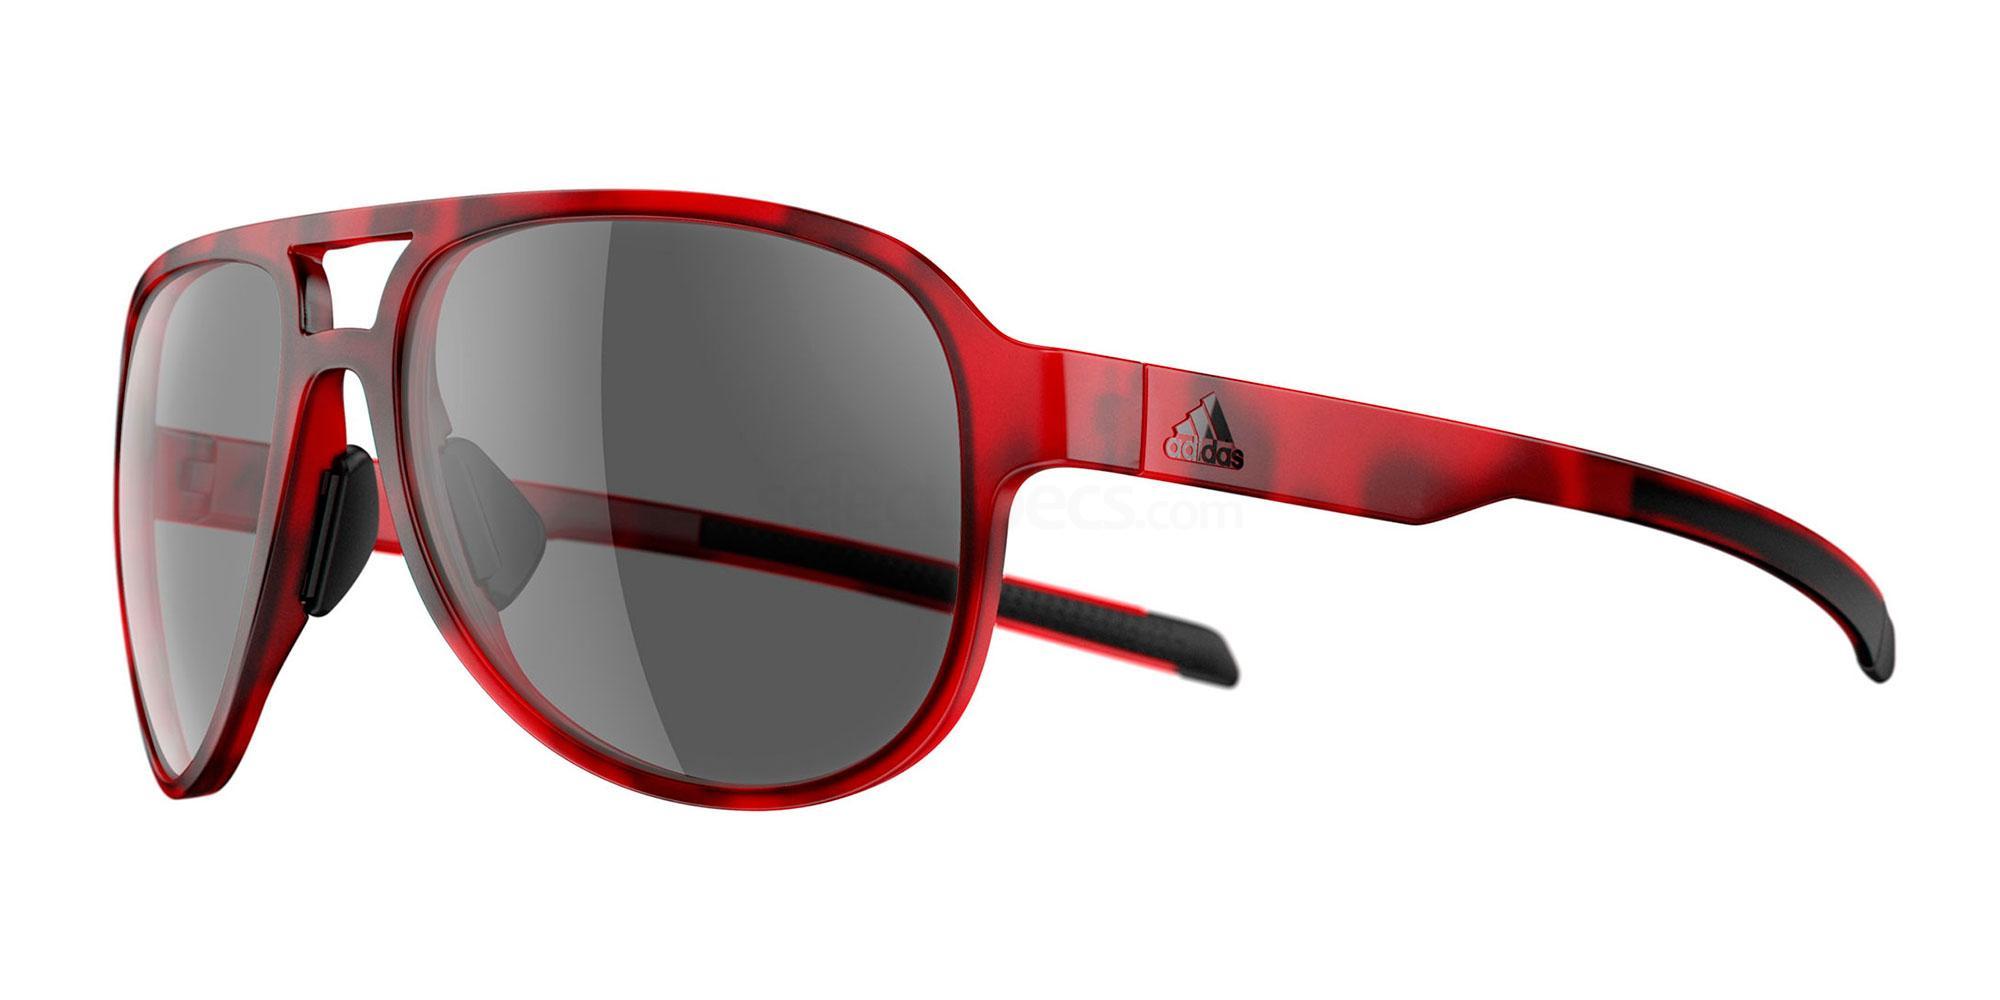 ad33 75 3000 ad33 Pacyr Sunglasses, Adidas